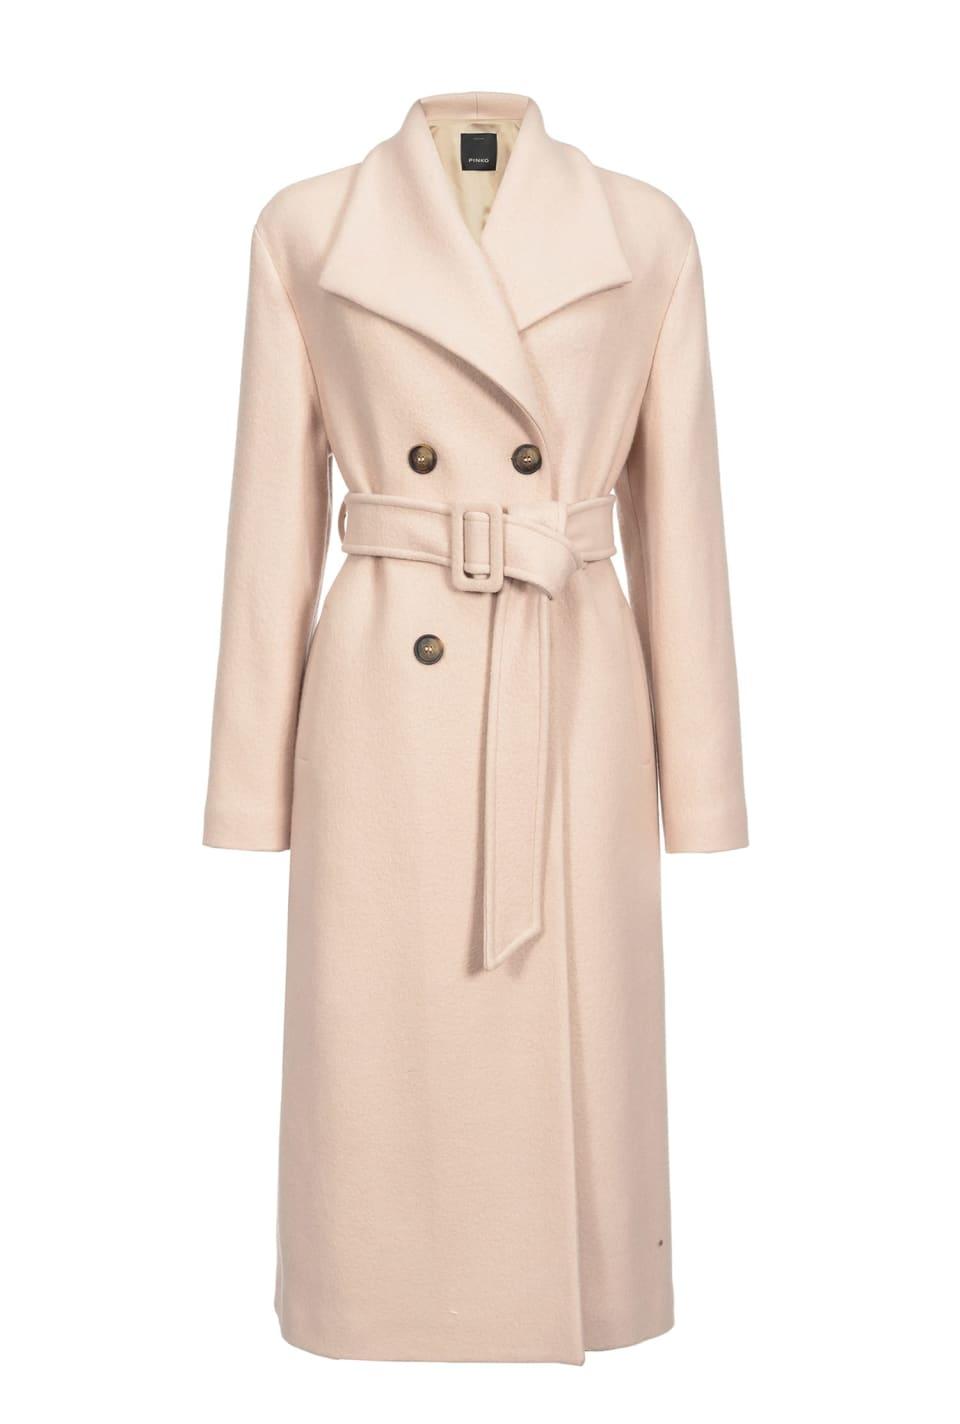 Abrigo tipo batín vintage